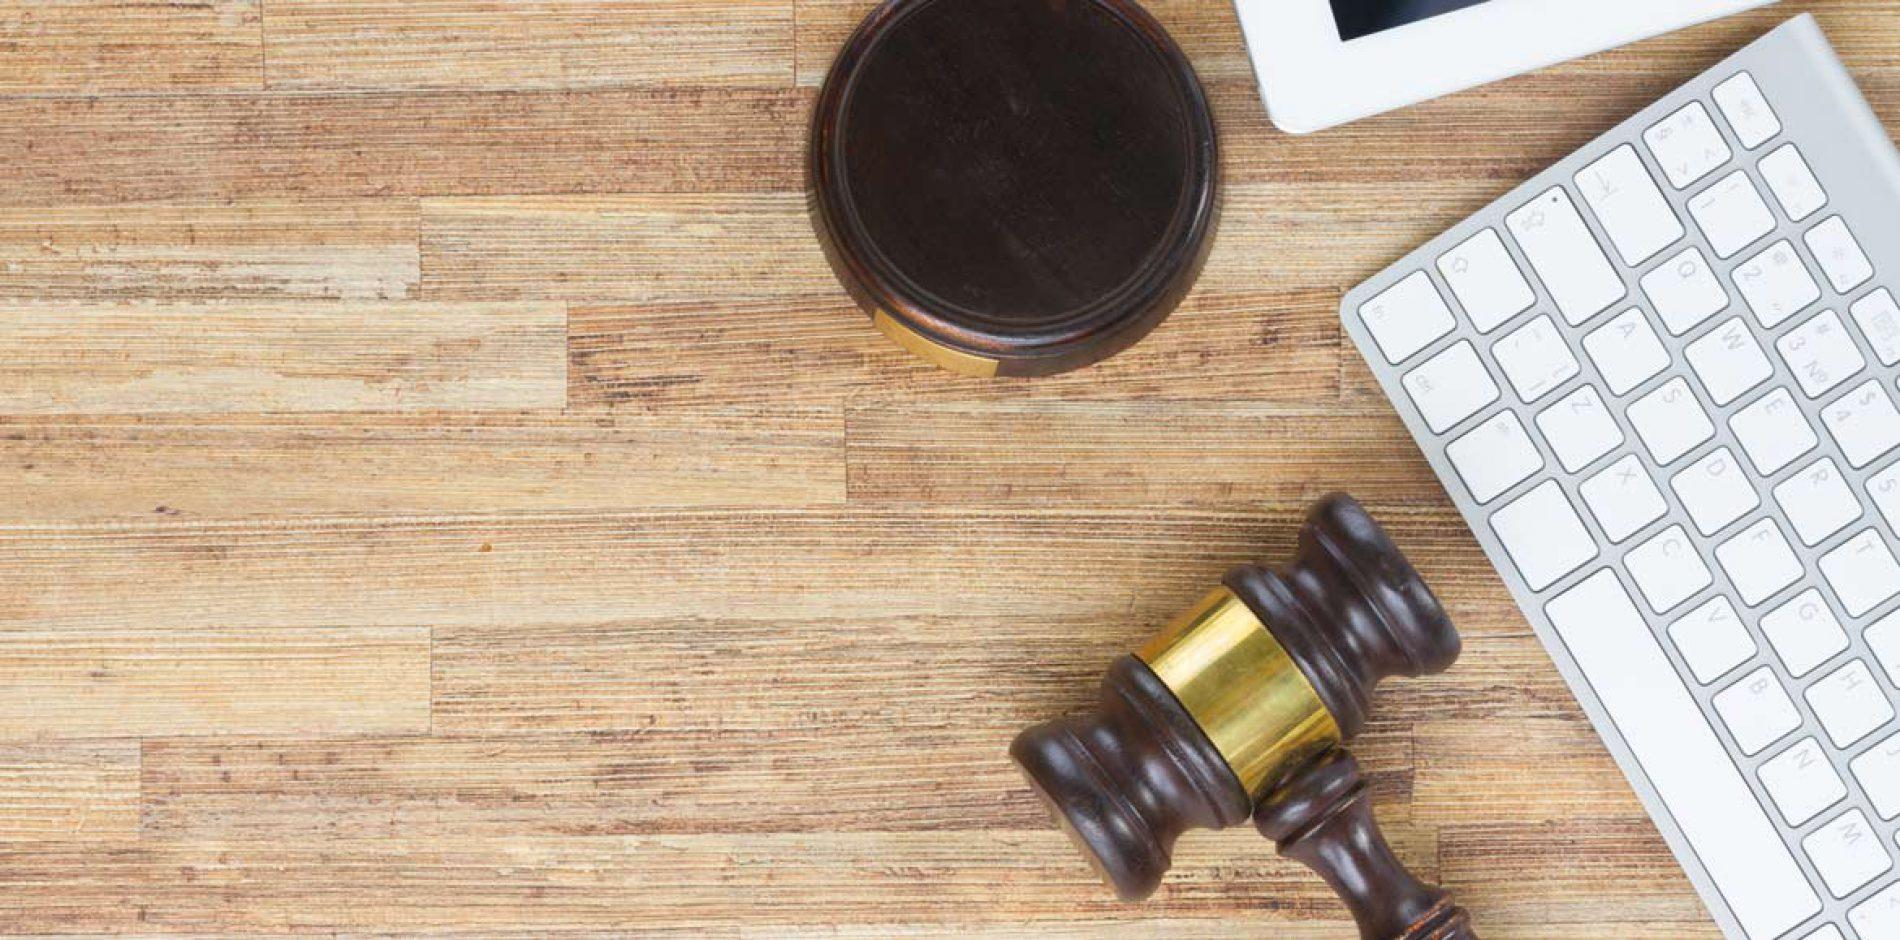 Giurisprudenza e smart-working: due sentenze dei Tribunali di Venezia e Mantova